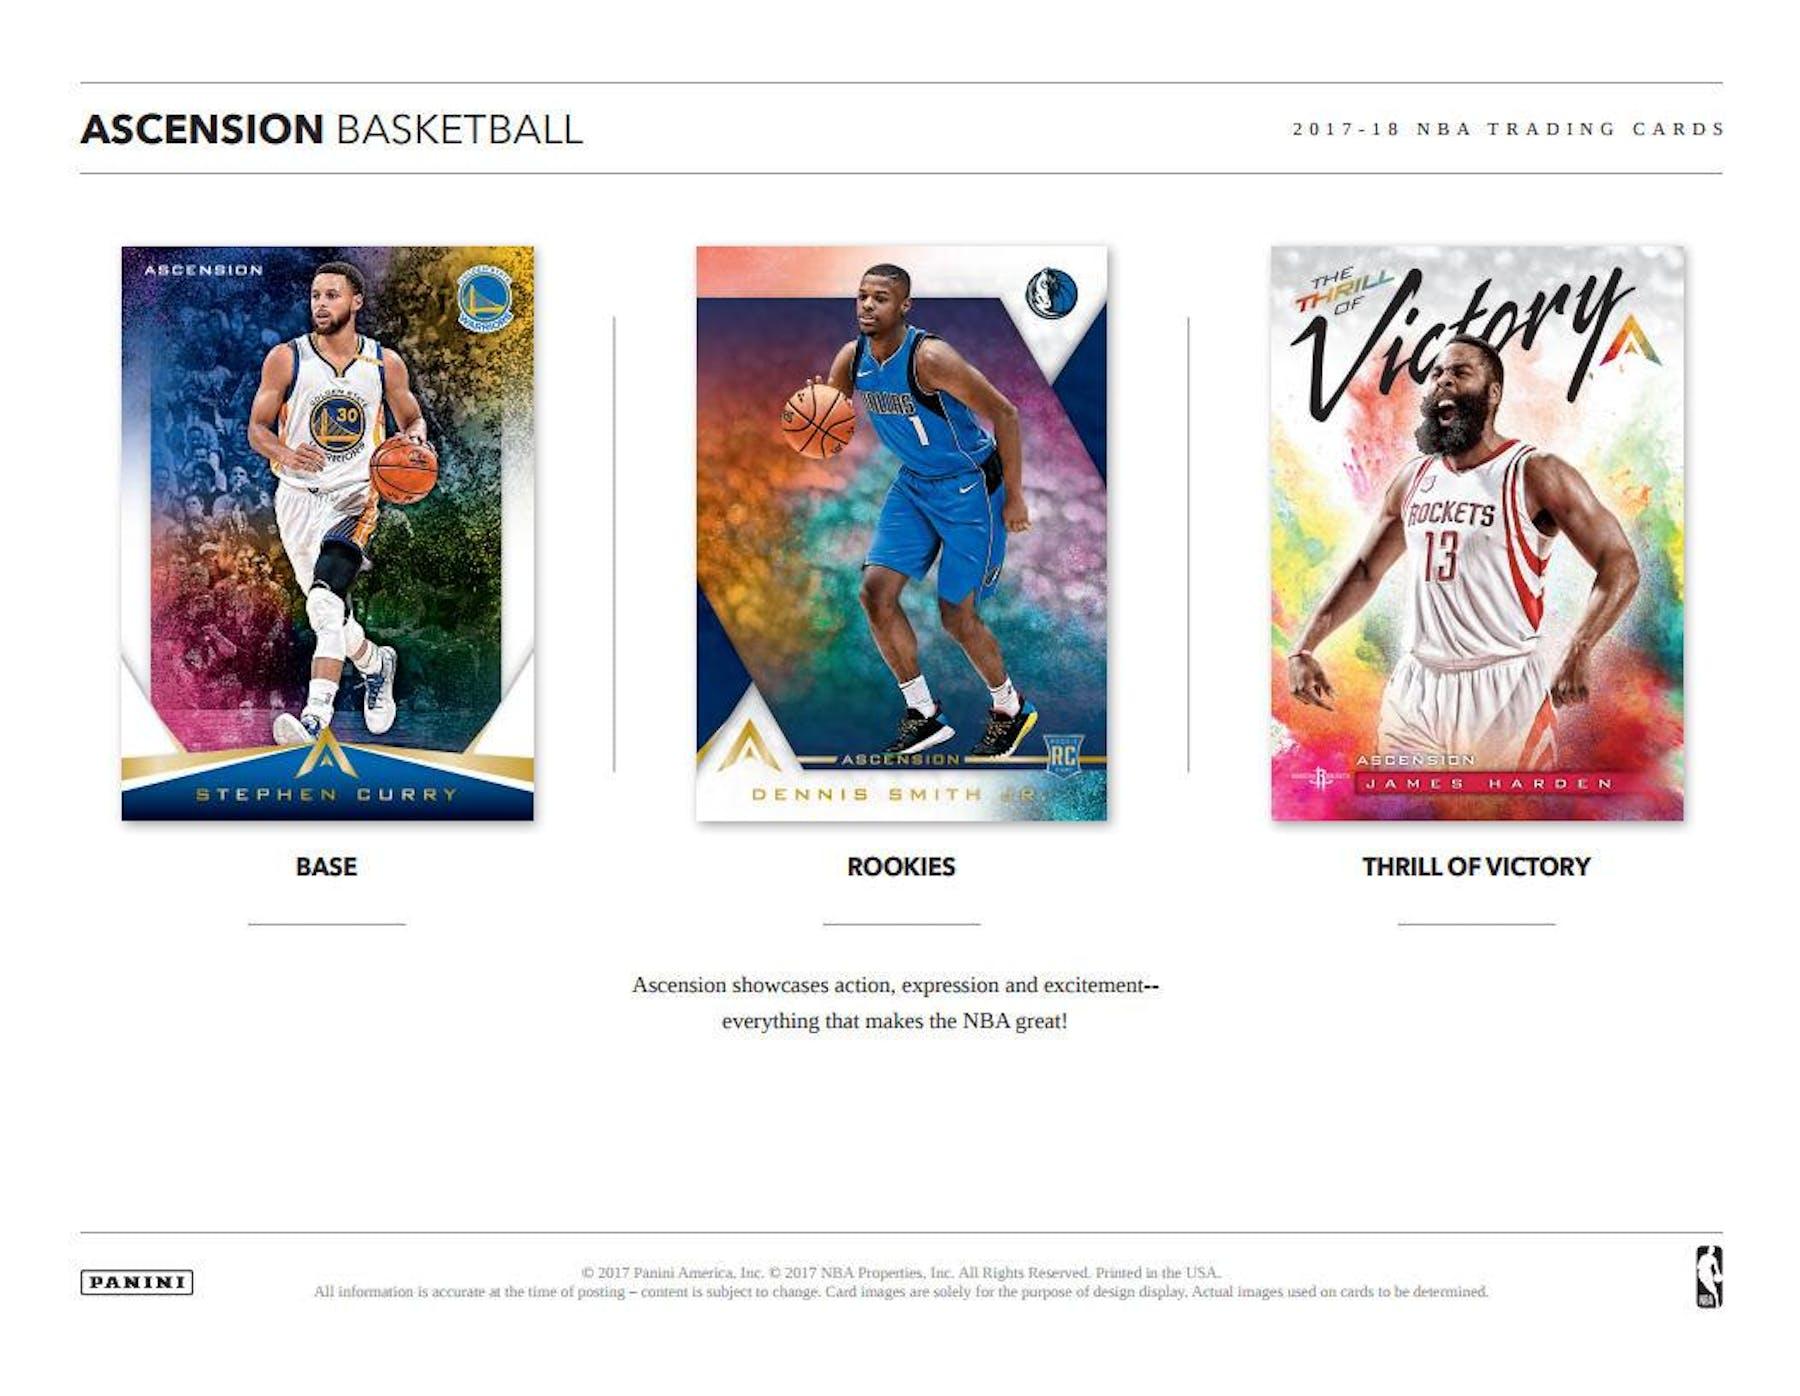 250aedd2d7b ... 2017 18 Panini Ascension Basketball Hobby Box ...